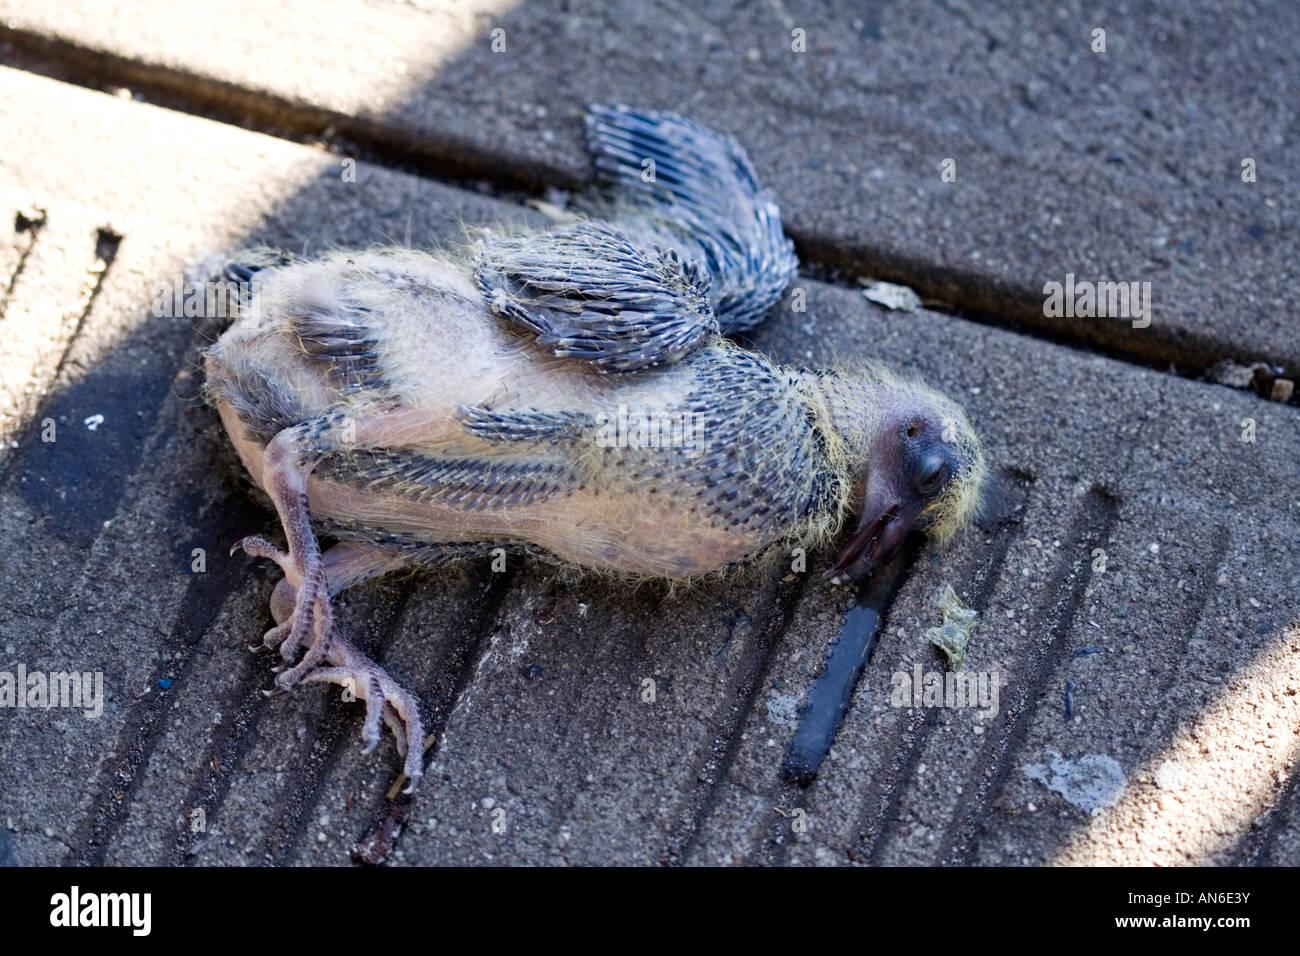 dead baby pigeon Stock Photo: 15427598 - Alamy